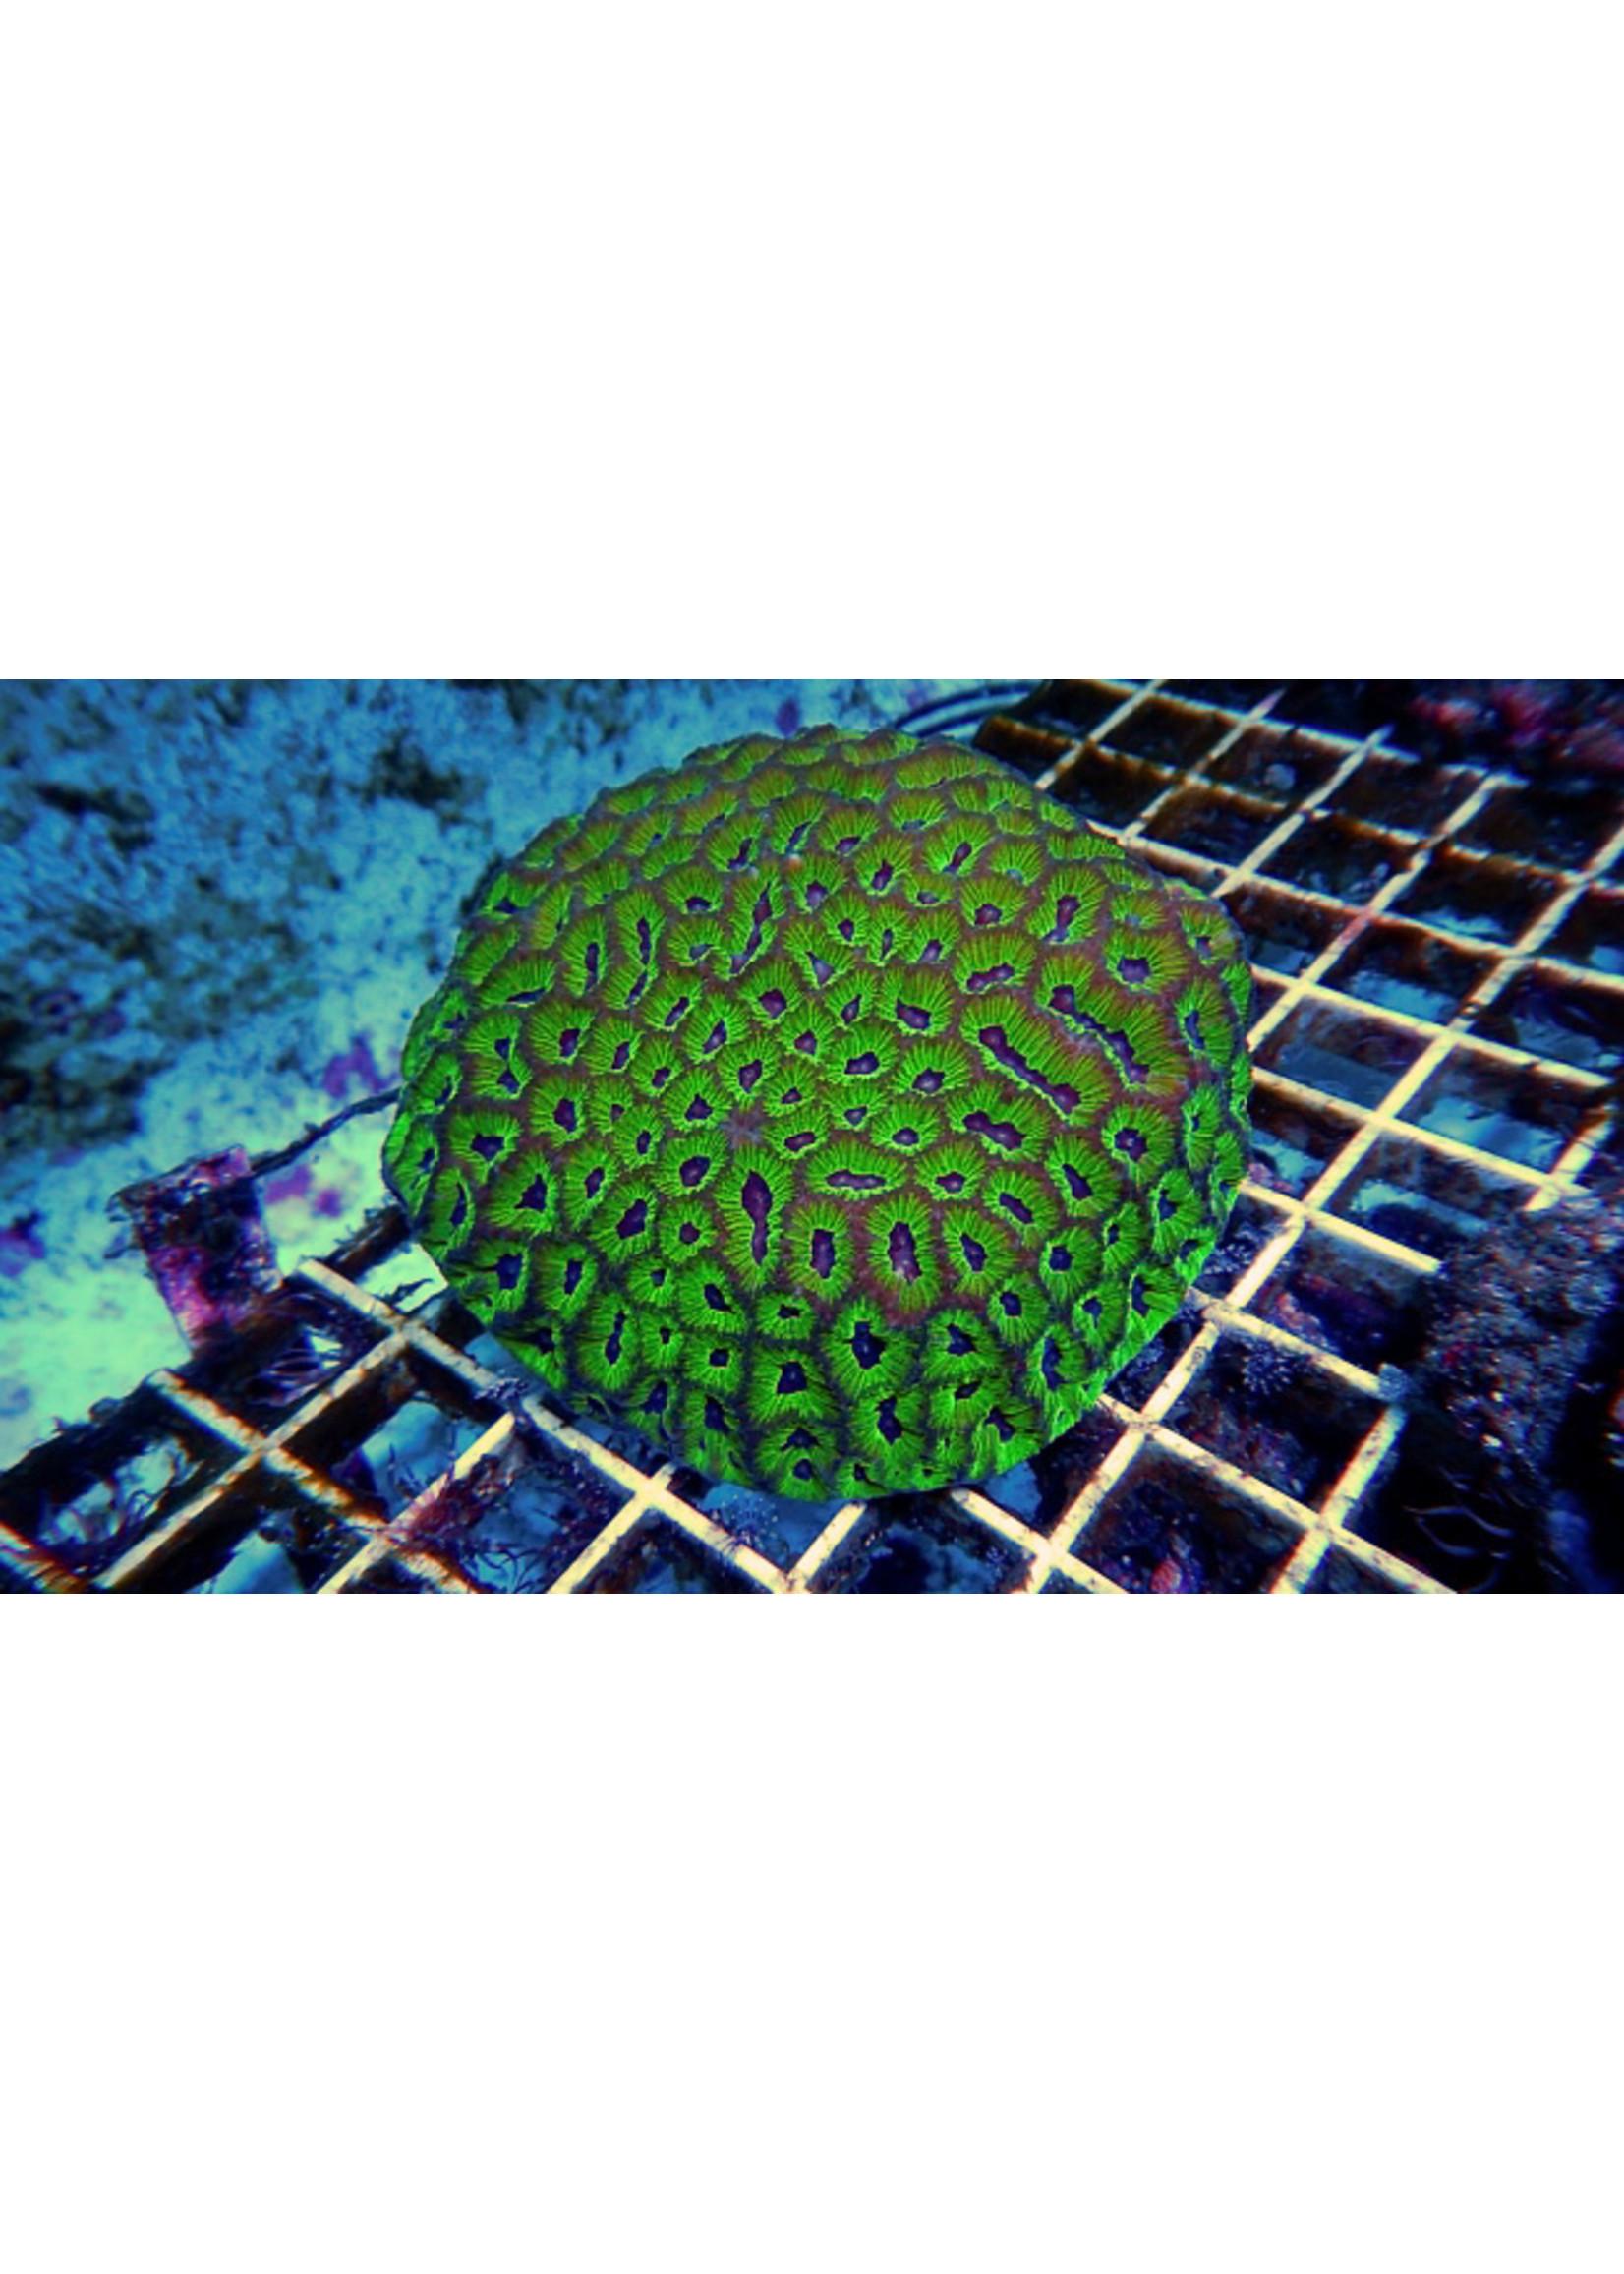 Favia Indo Favia Coral  WYSIWYG